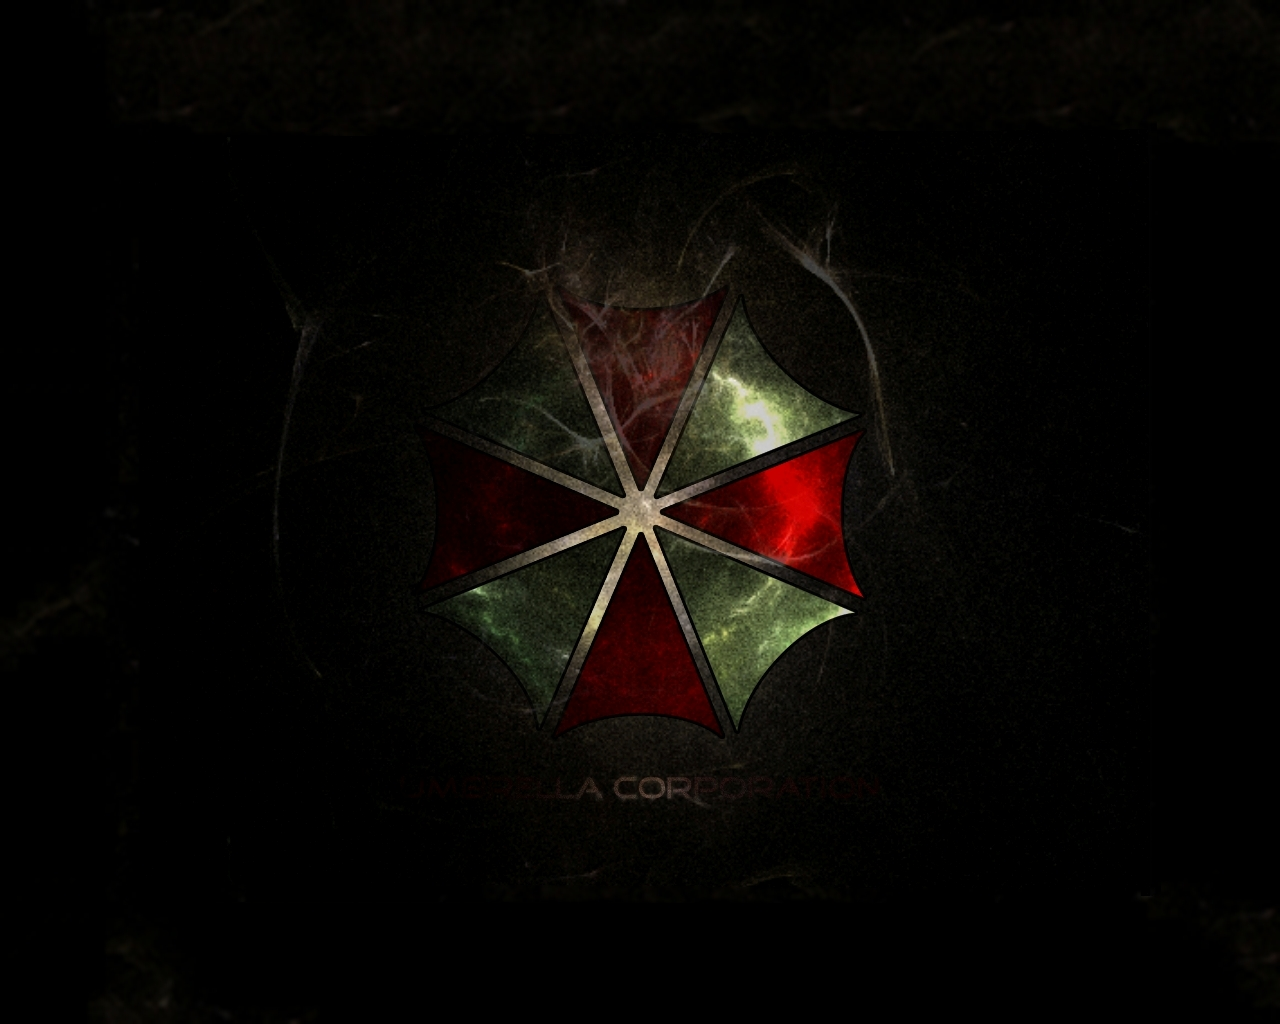 3d Celtic Cross Wallpaper Resident Evil Backgrounds Hd Desktop Wallpapers 4k Hd